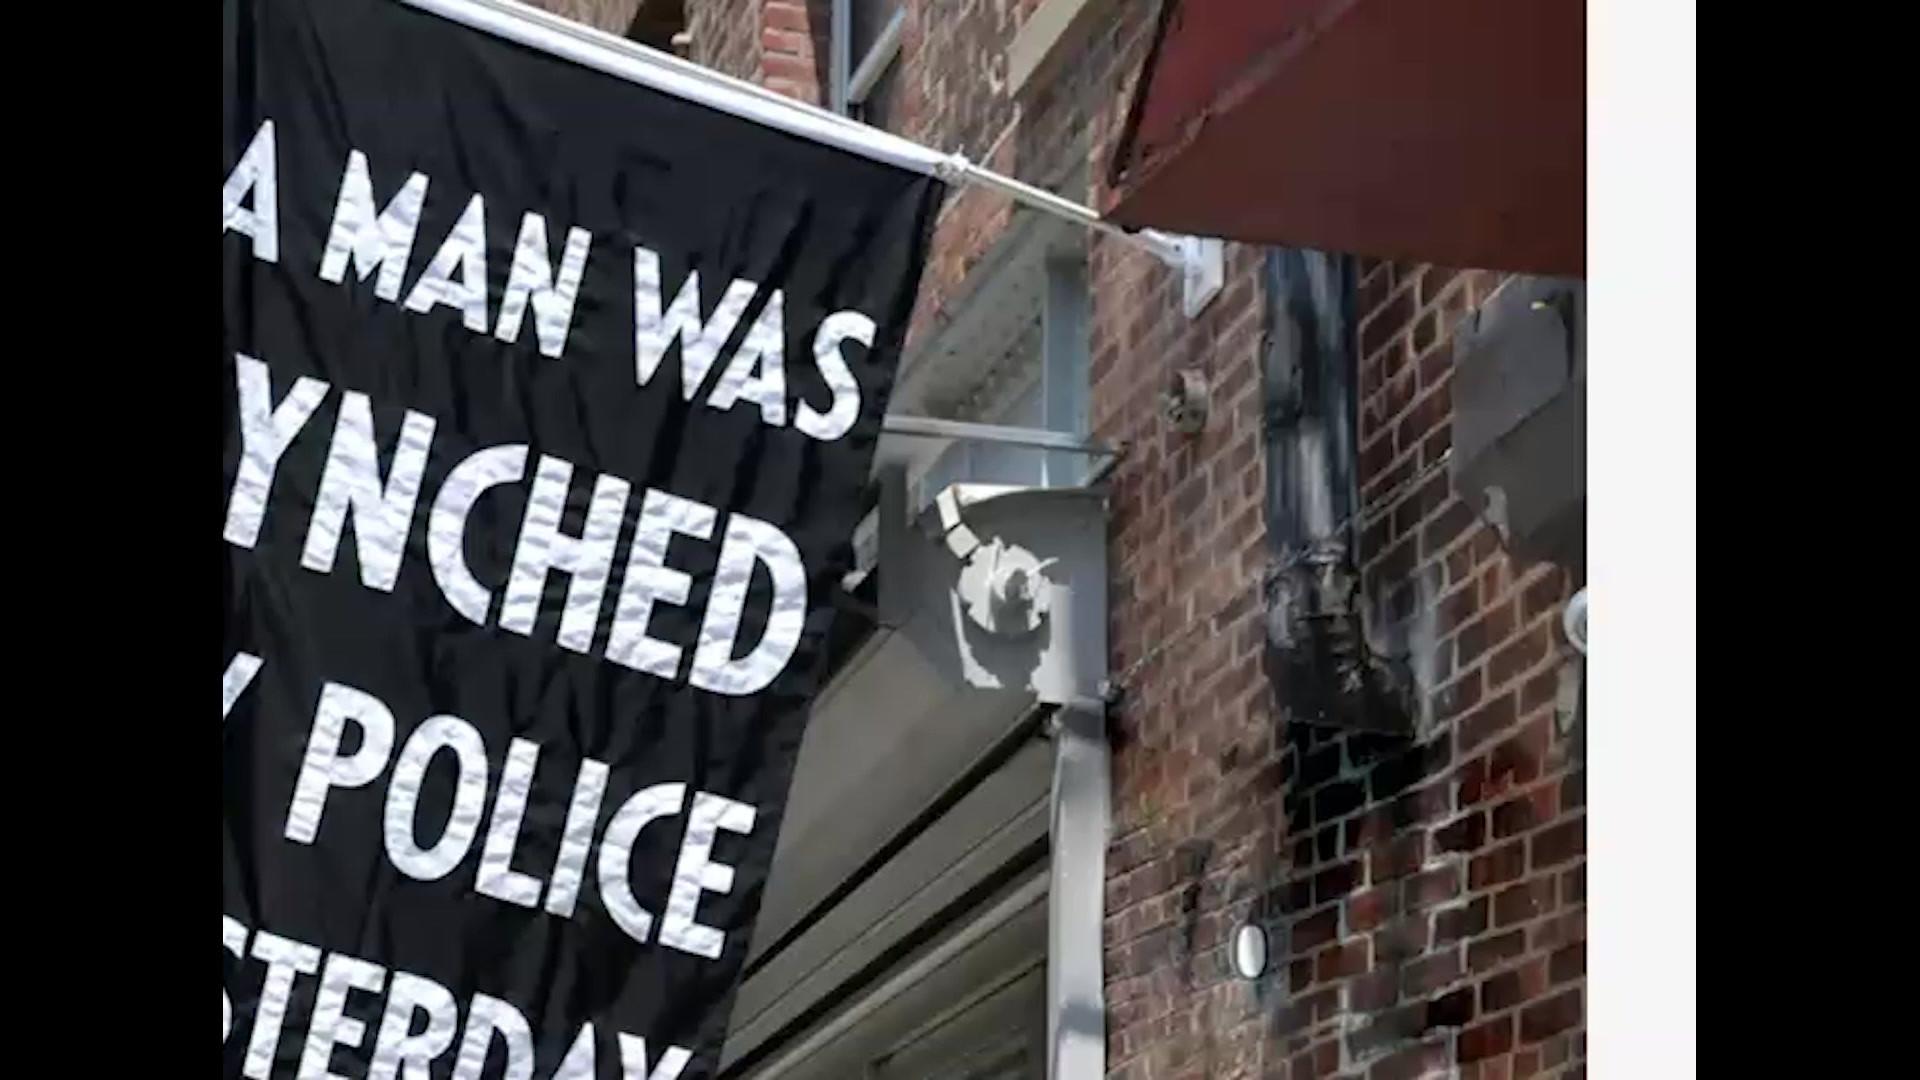 Dread_A Man Was Lynched.mp4